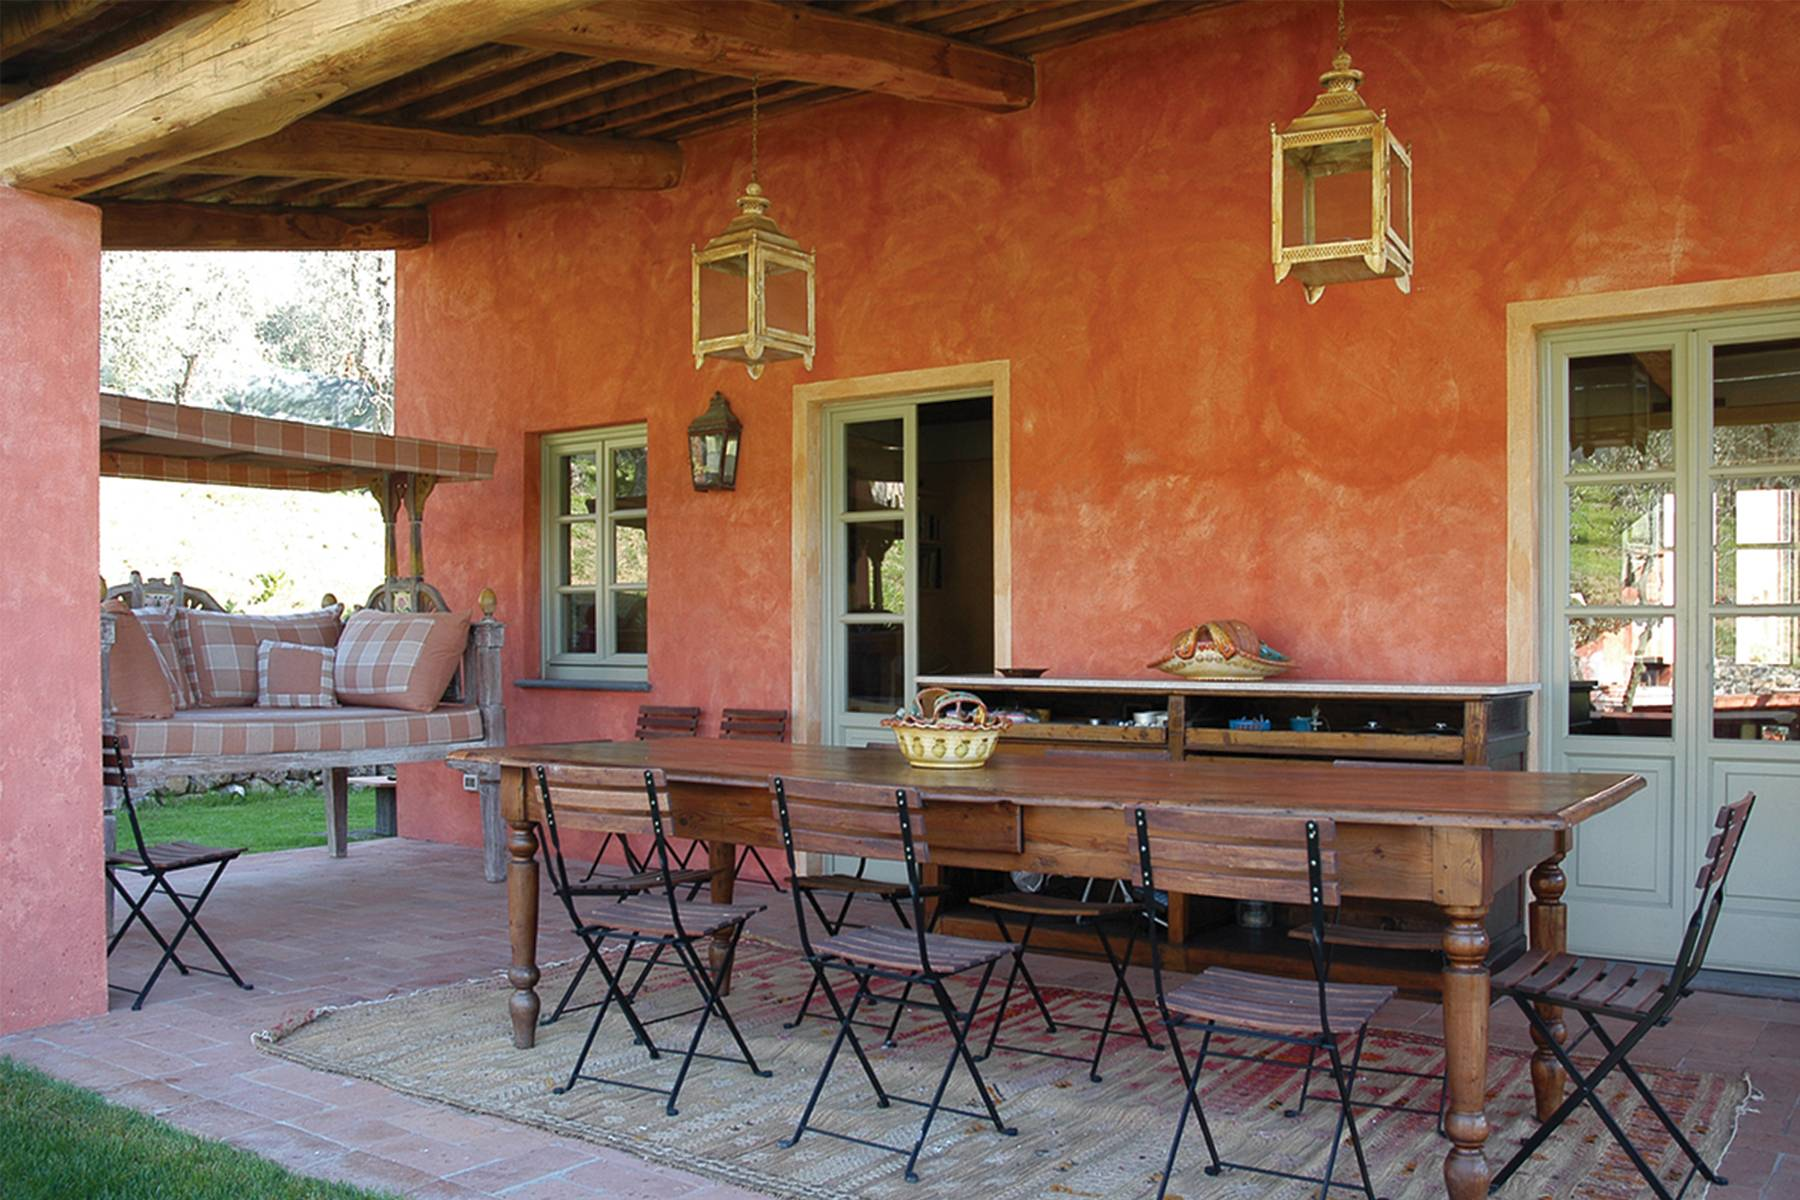 Casa indipendente in Vendita a Massarosa: 5 locali, 350 mq - Foto 6